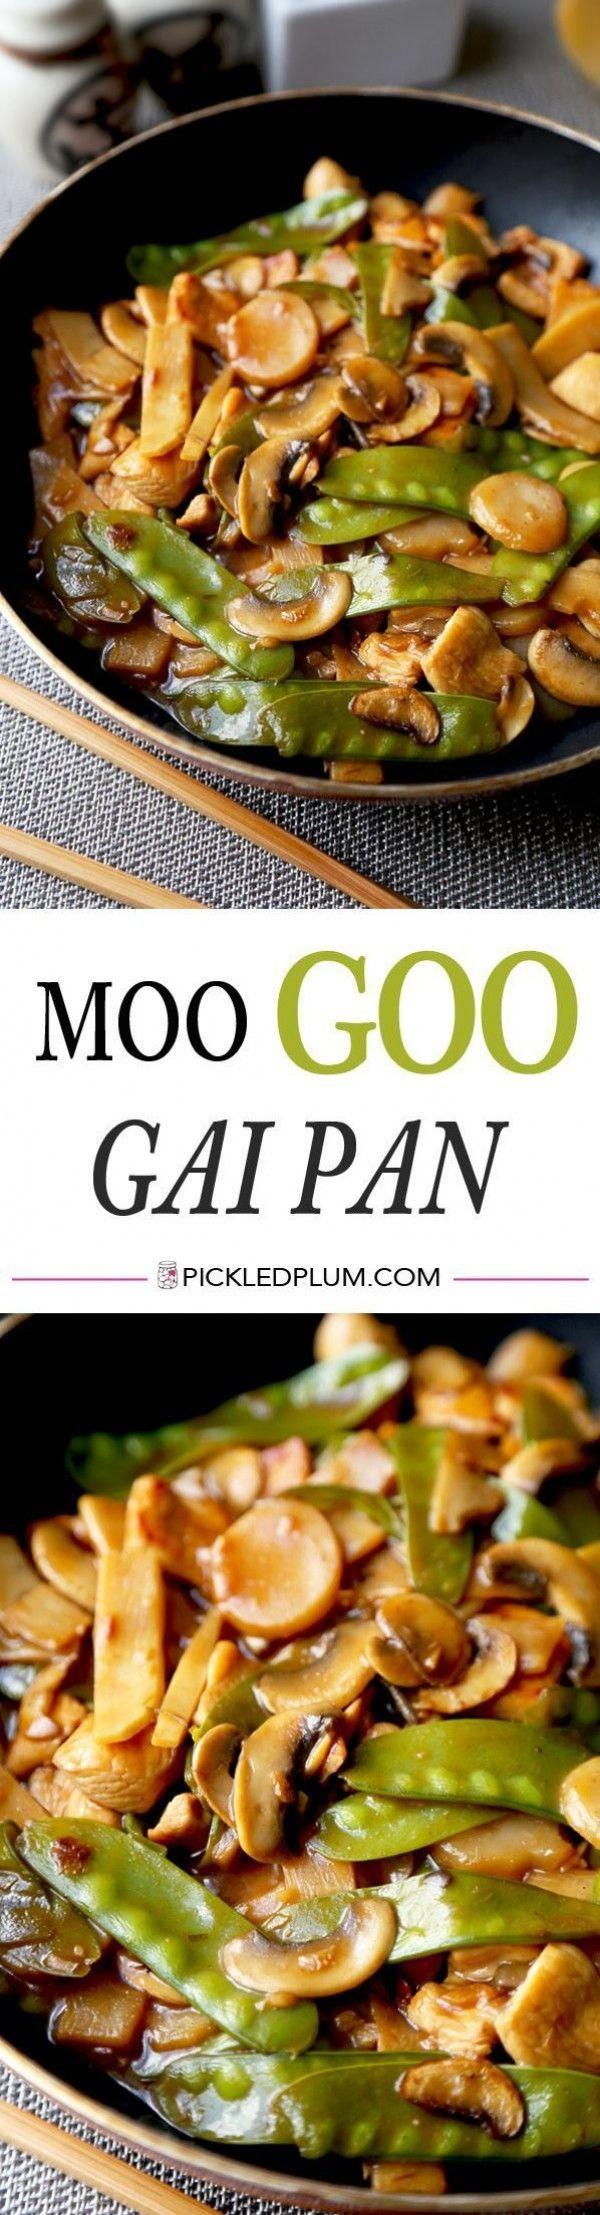 Get the recipe Moo Goo Gai Pan @recipes_to_go